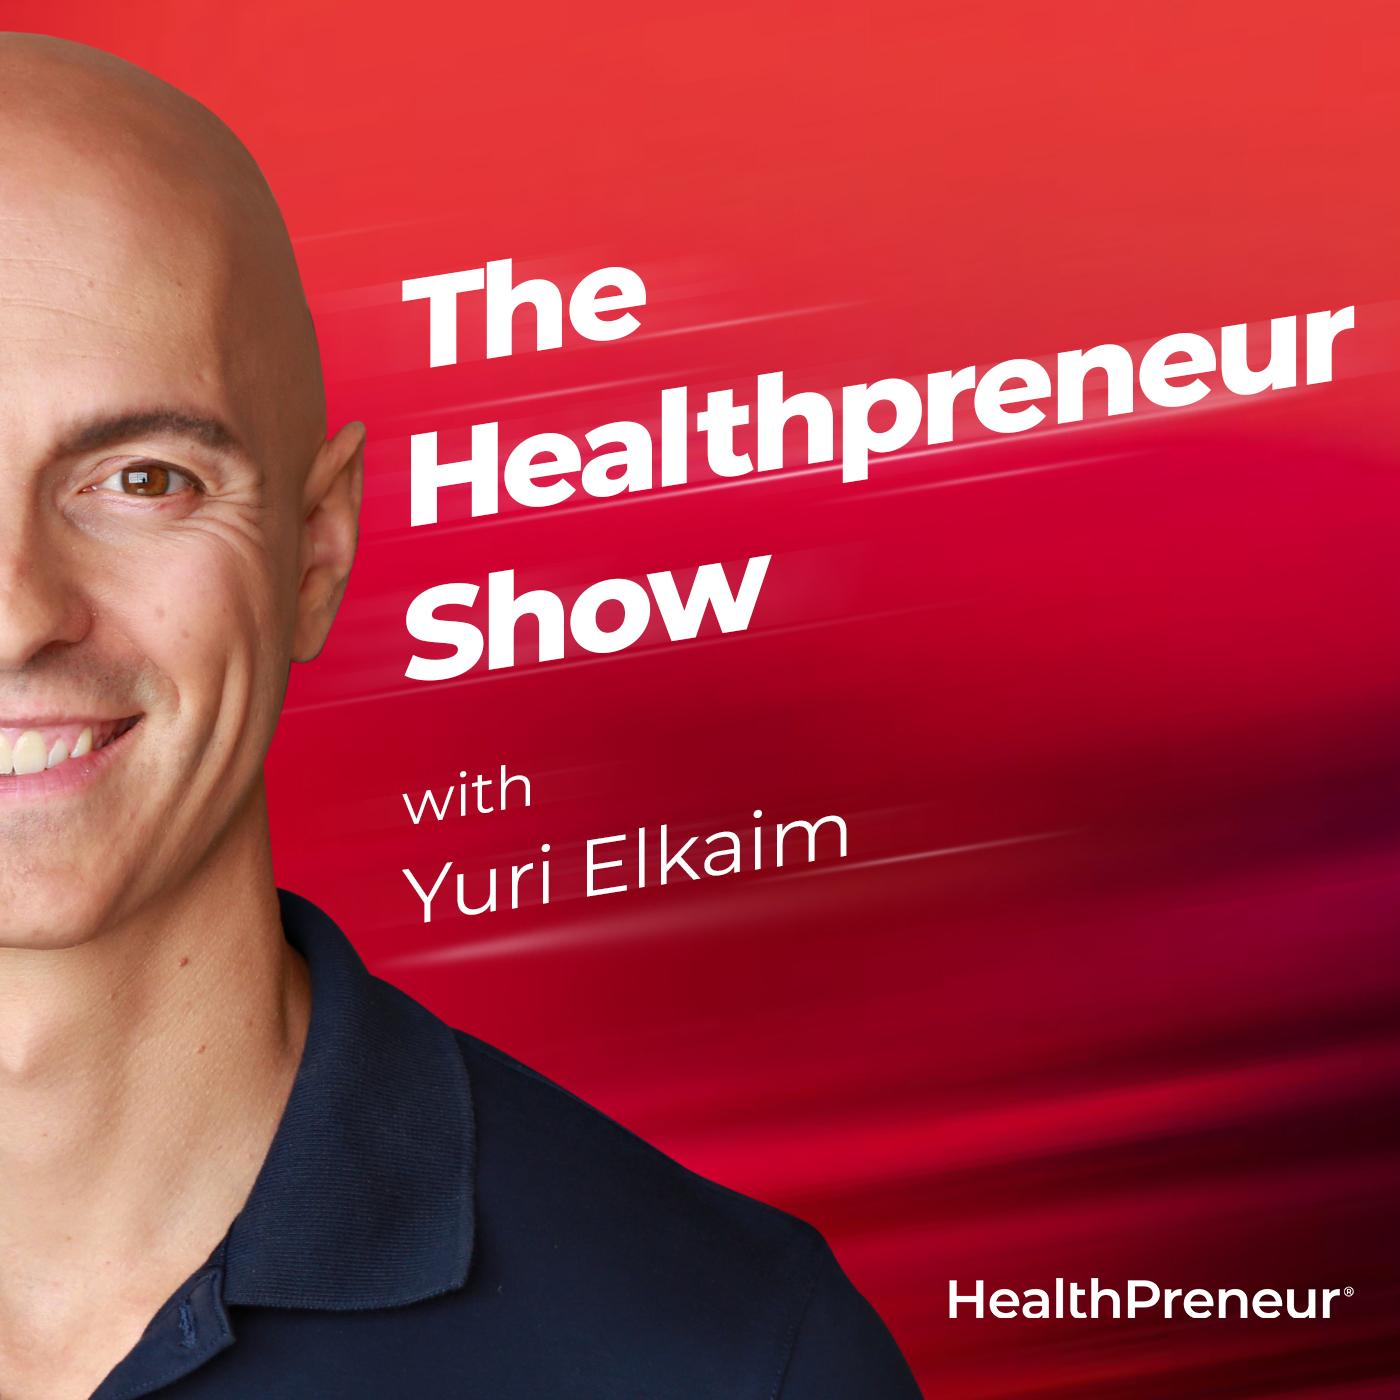 The Healthpreneur Show with Yuri Elkaim show art